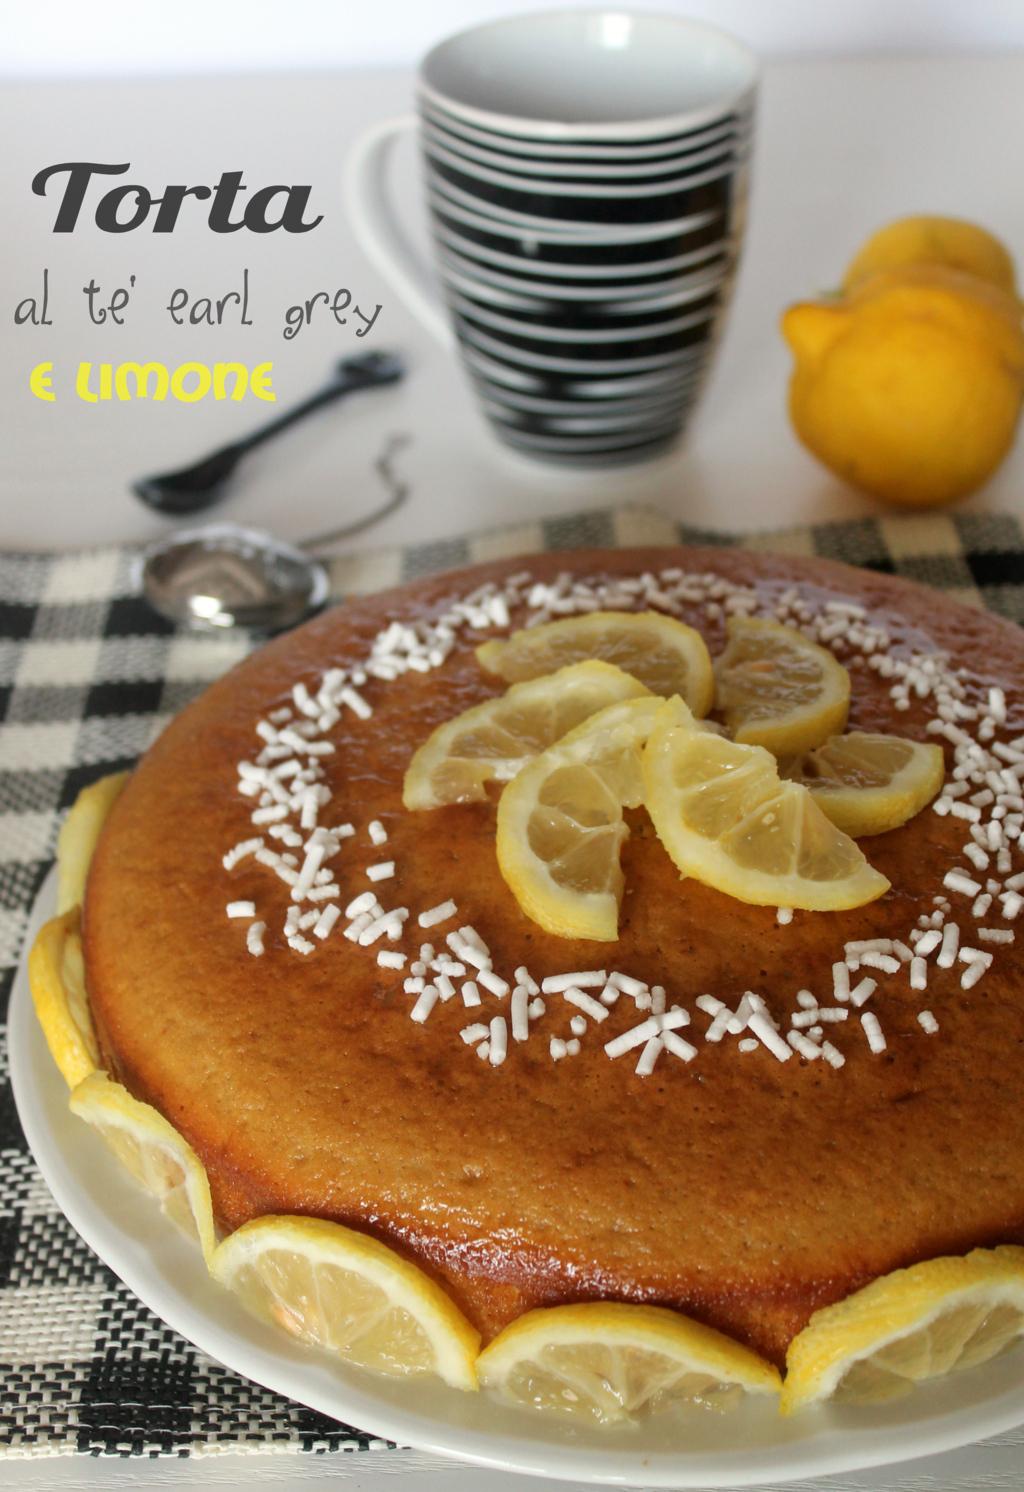 torta al té earl grey e limone